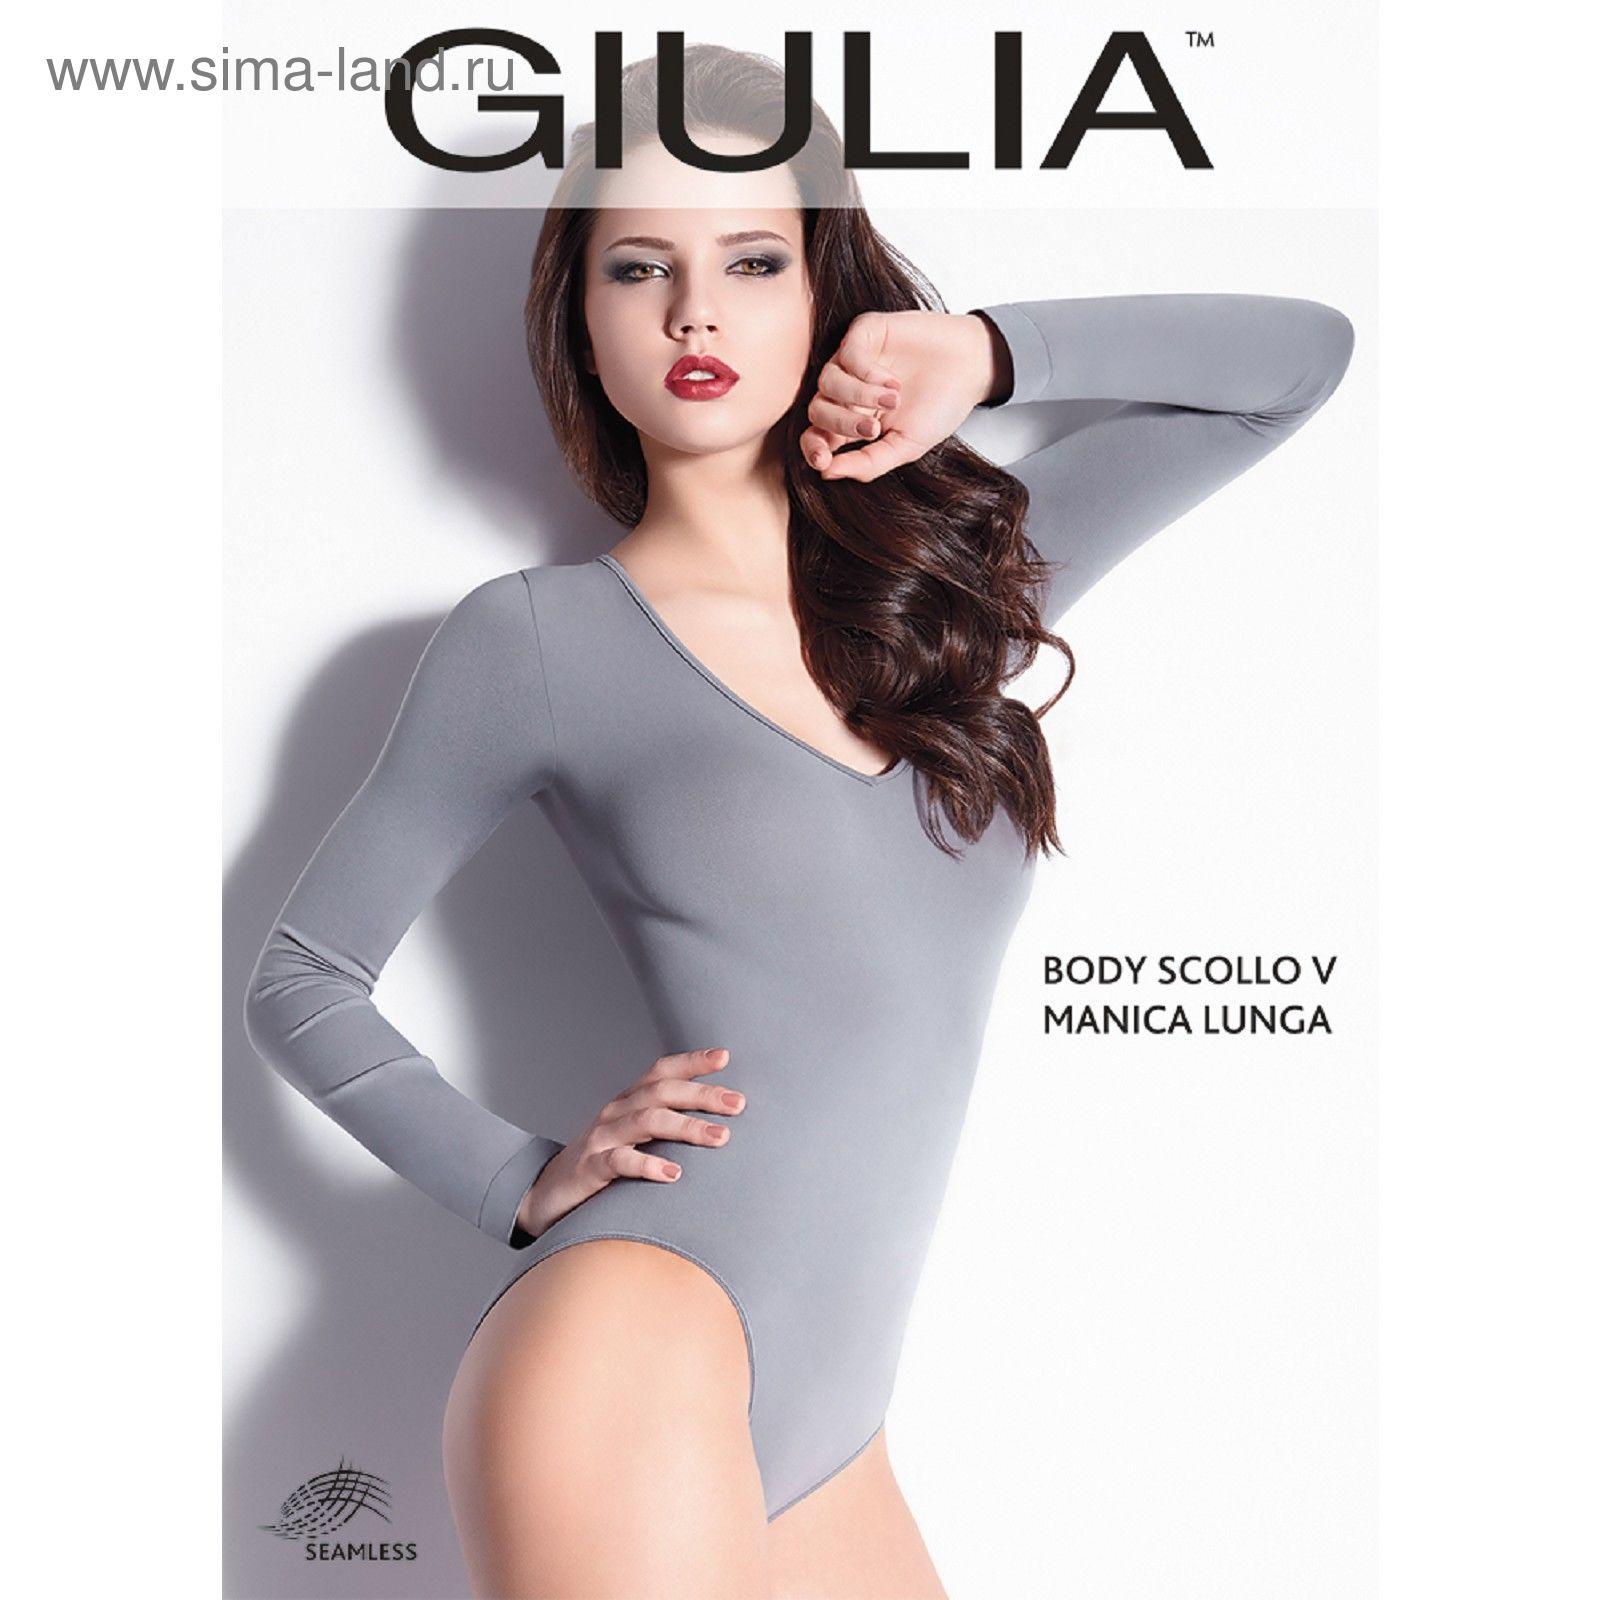 f5f821e1c11d662 Боди женское, цвет белый (bianco), размер M/L 607915 (BODY SCOLLO V ...